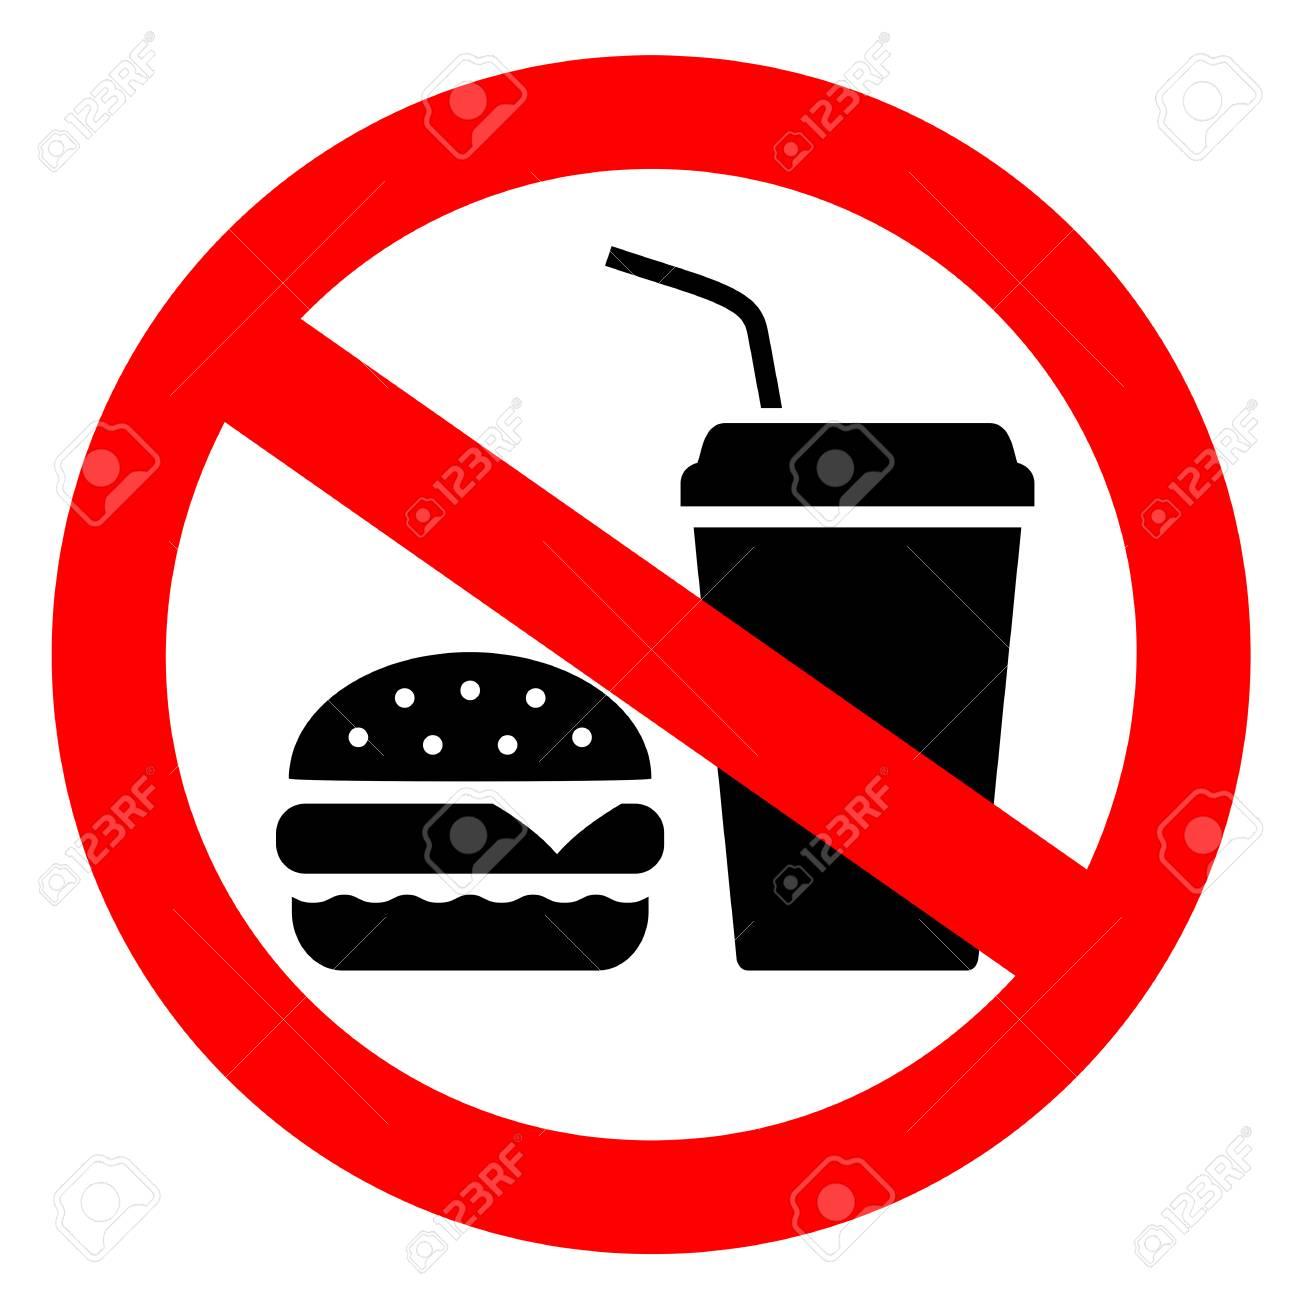 No eating vector sign - 106319375